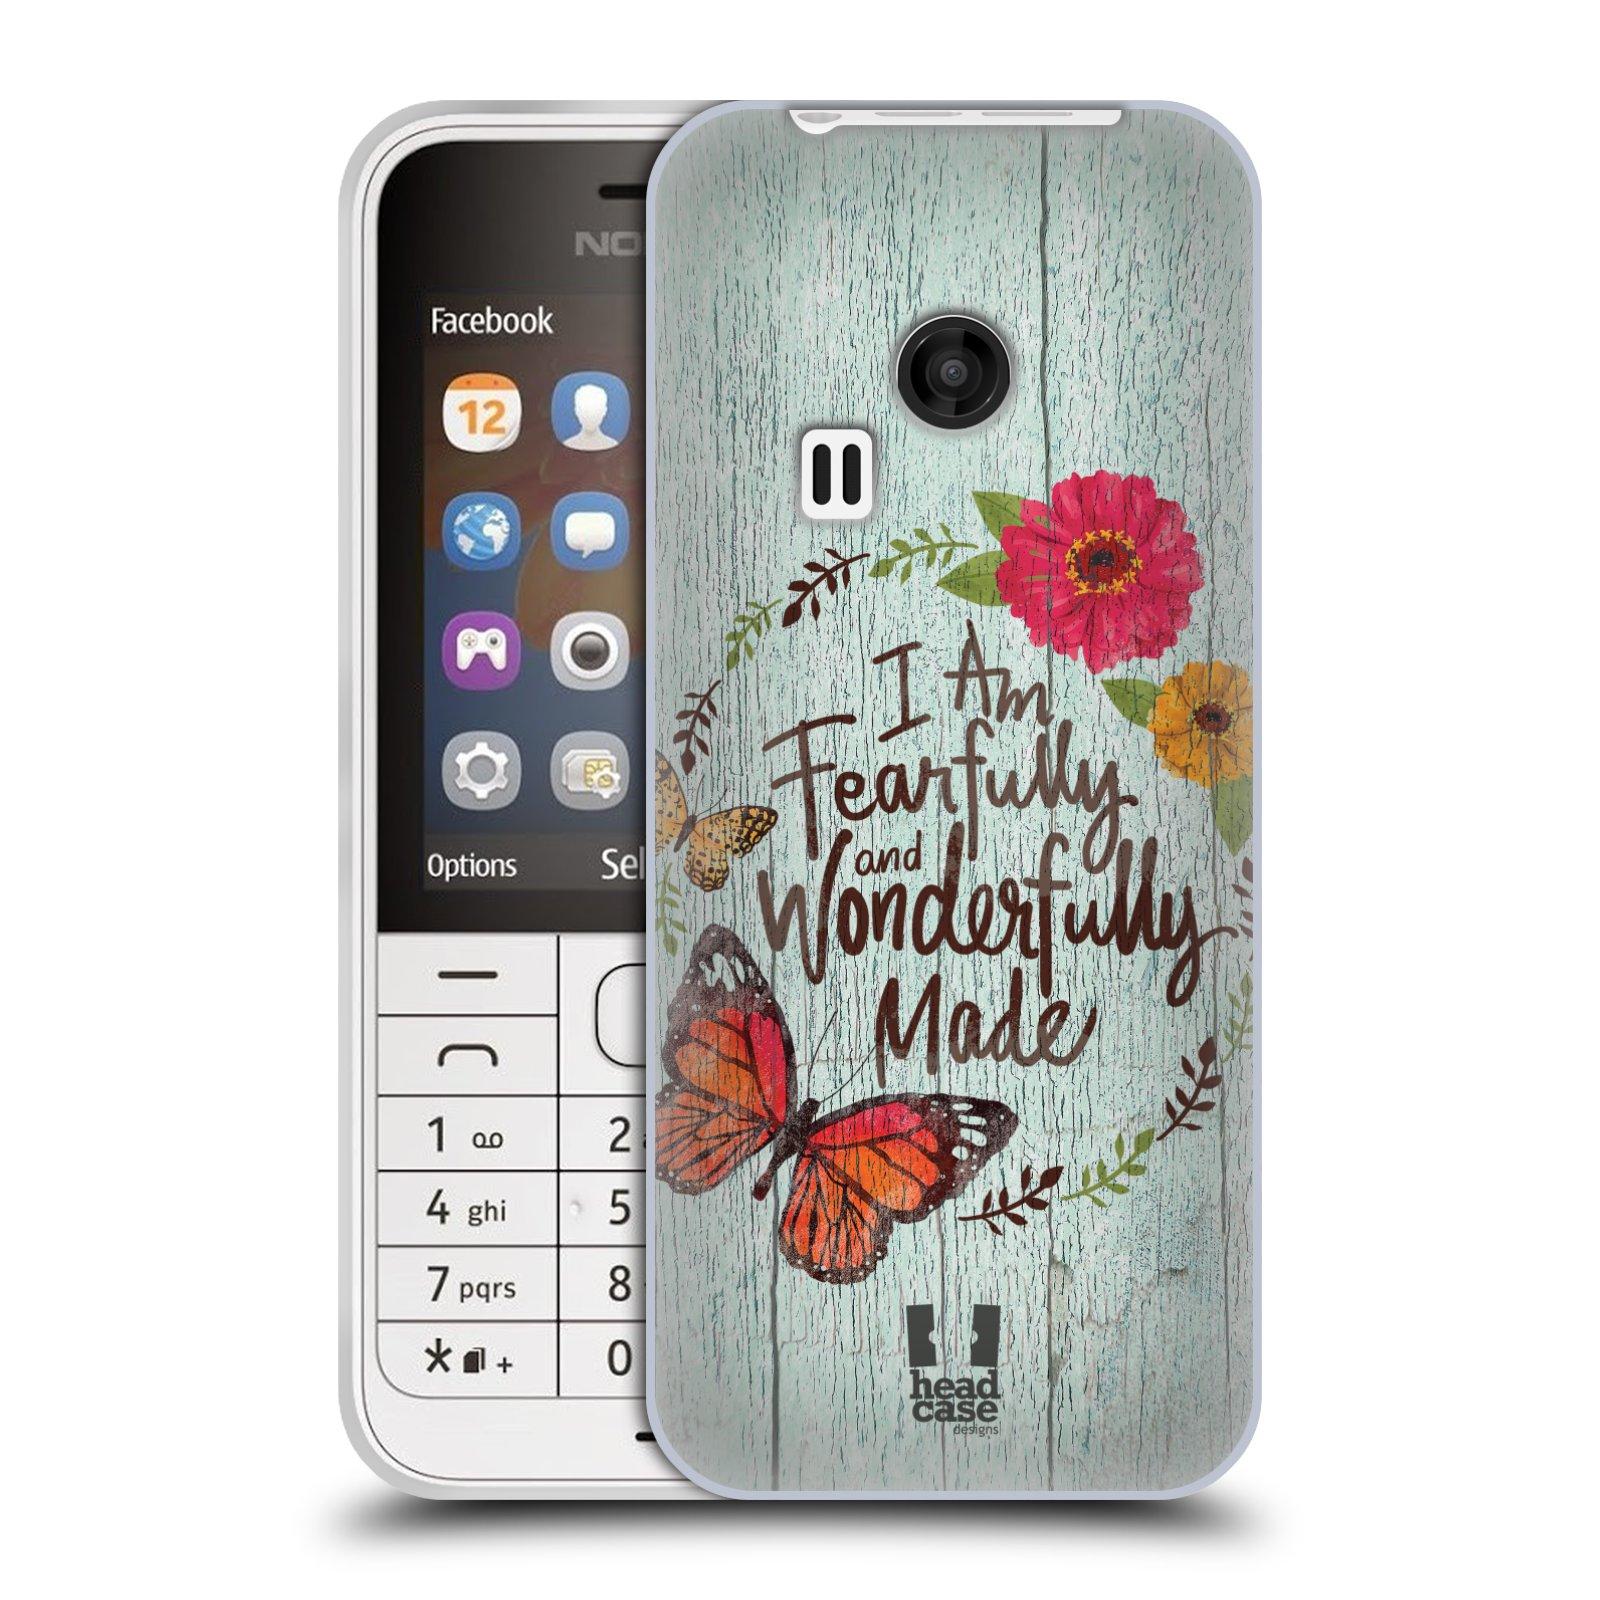 Silikonové pouzdro na mobil Nokia 220 HEAD CASE LIFE IN THE COUNTRY WONDERFULLY